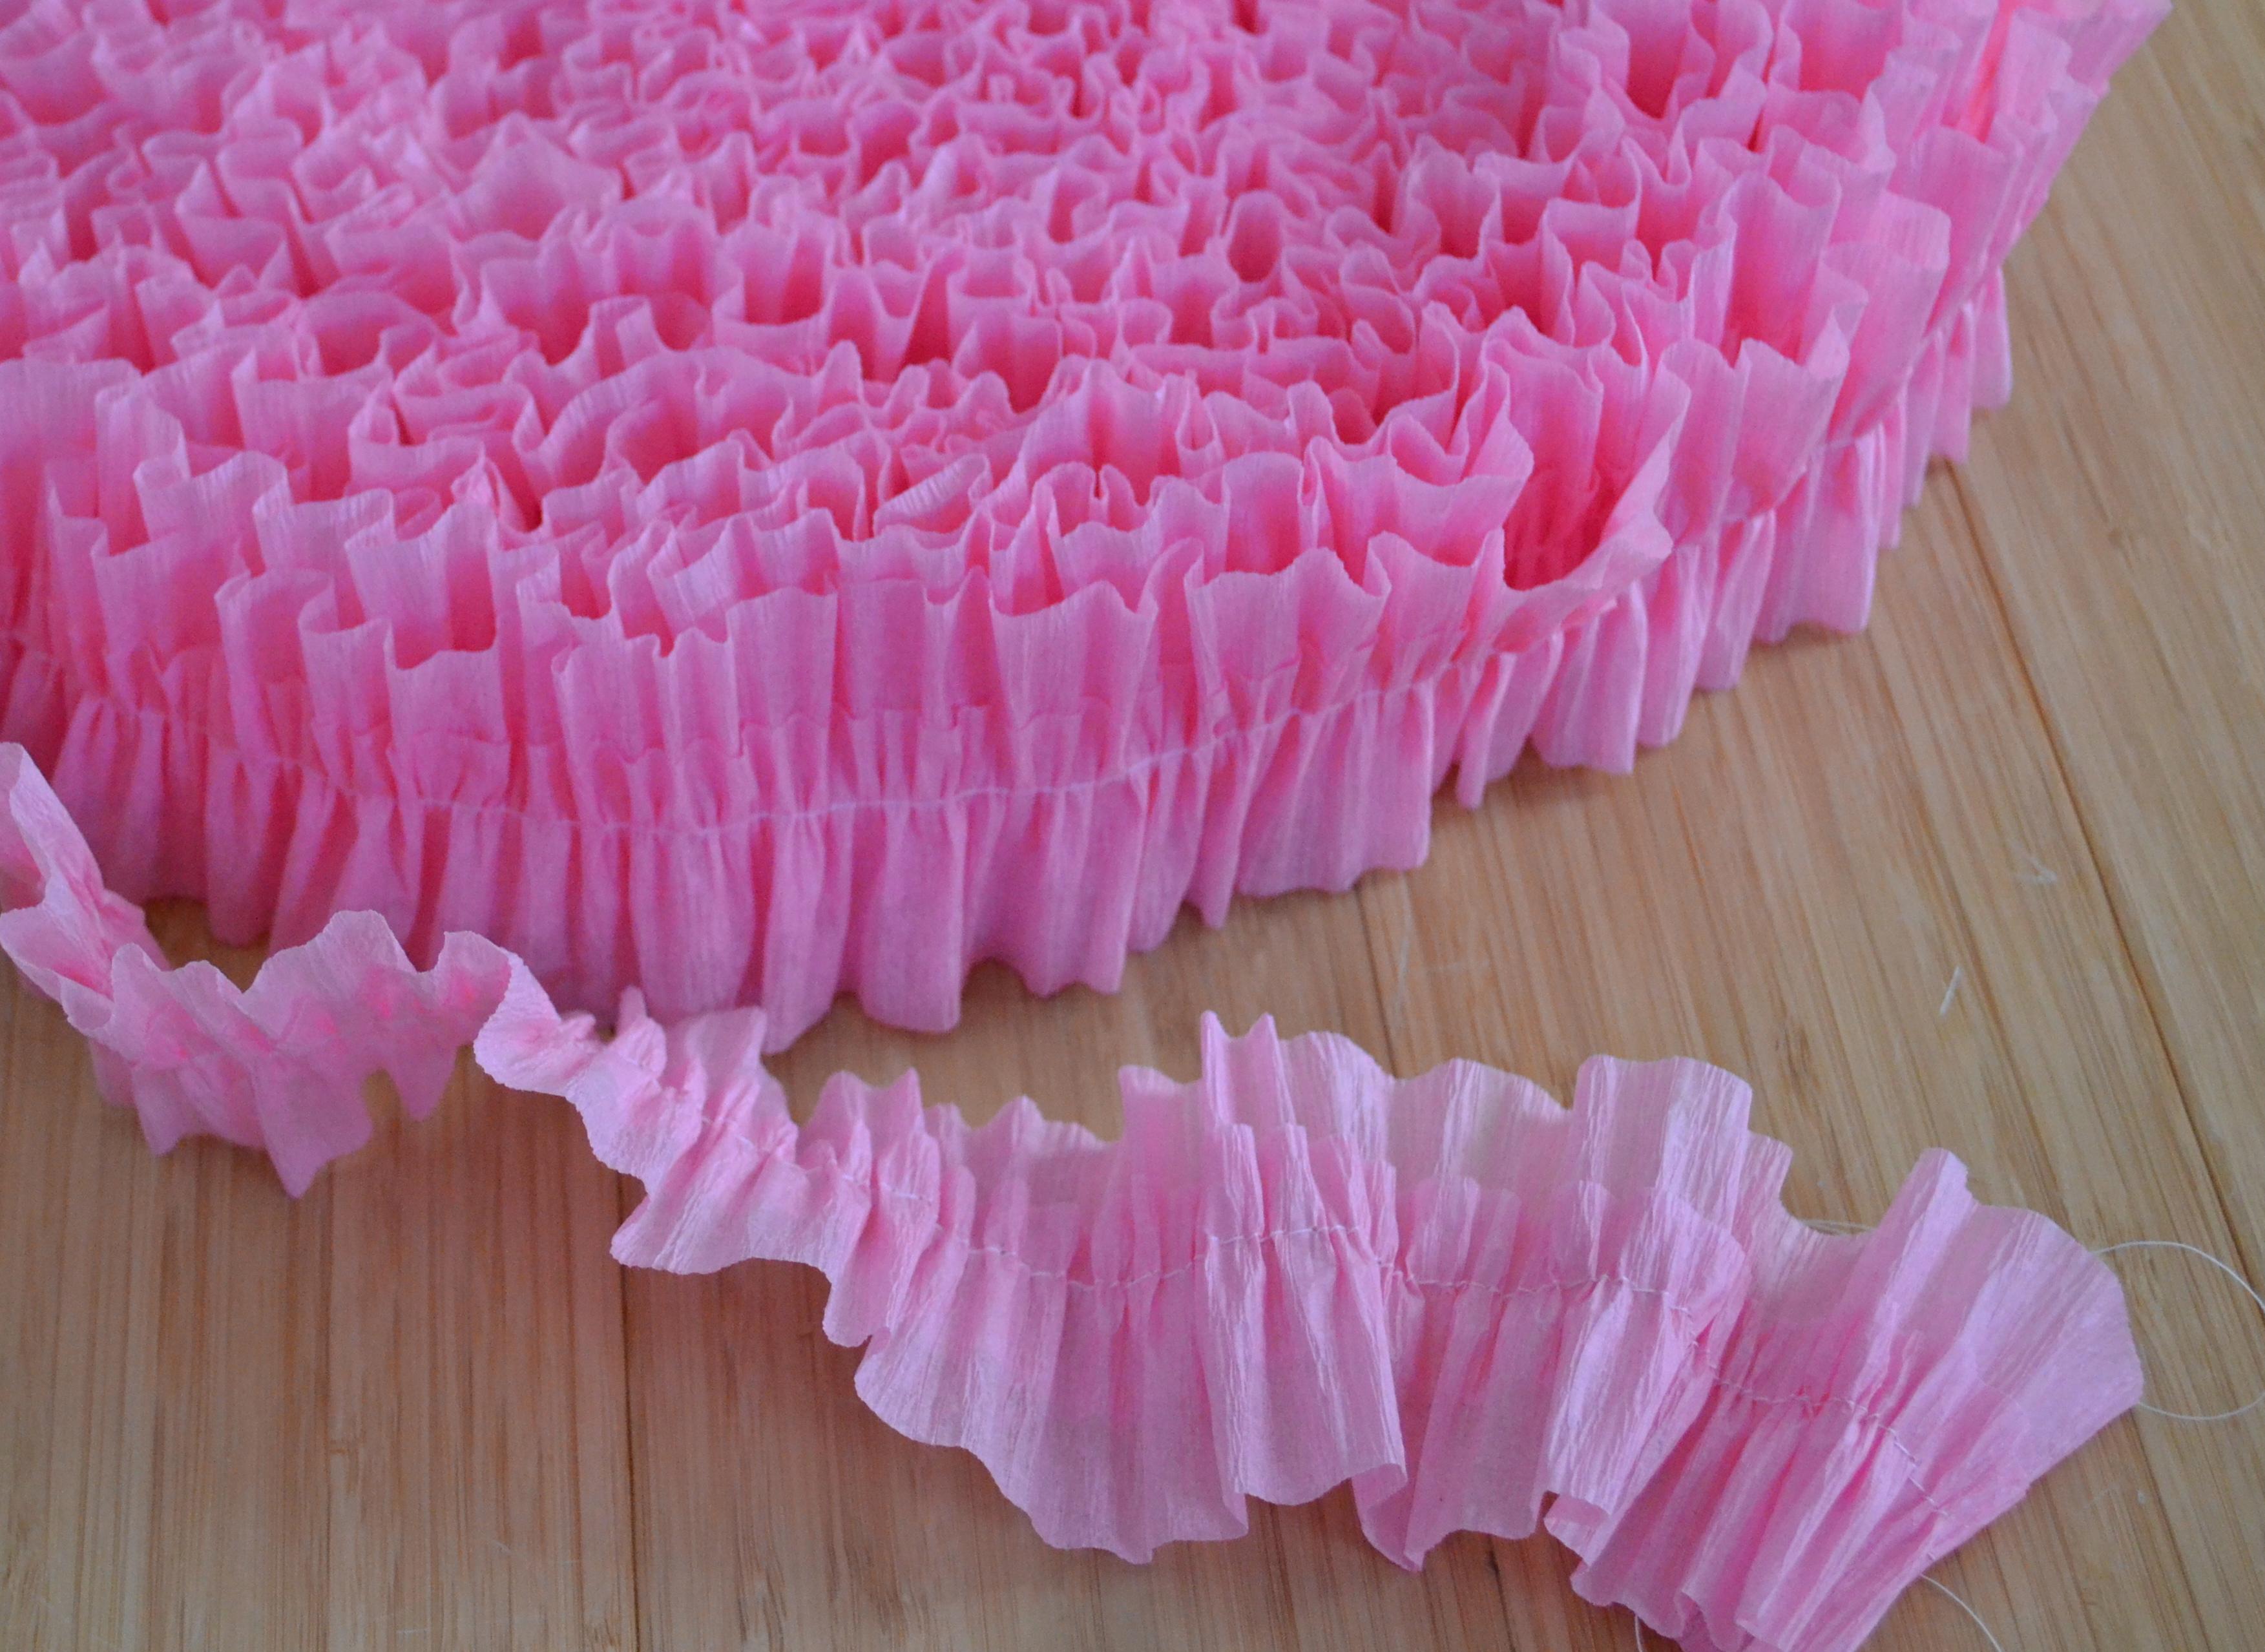 How To Make Ruffled Crepe Paper Living Well Spending Less